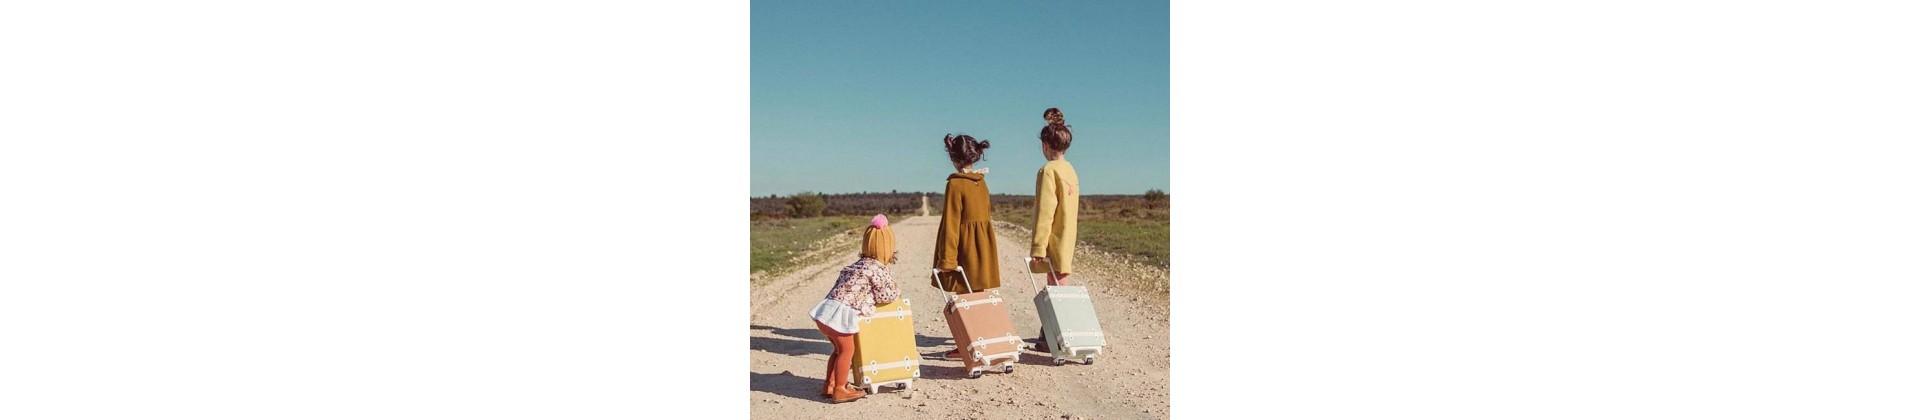 Sac de voyage, valise